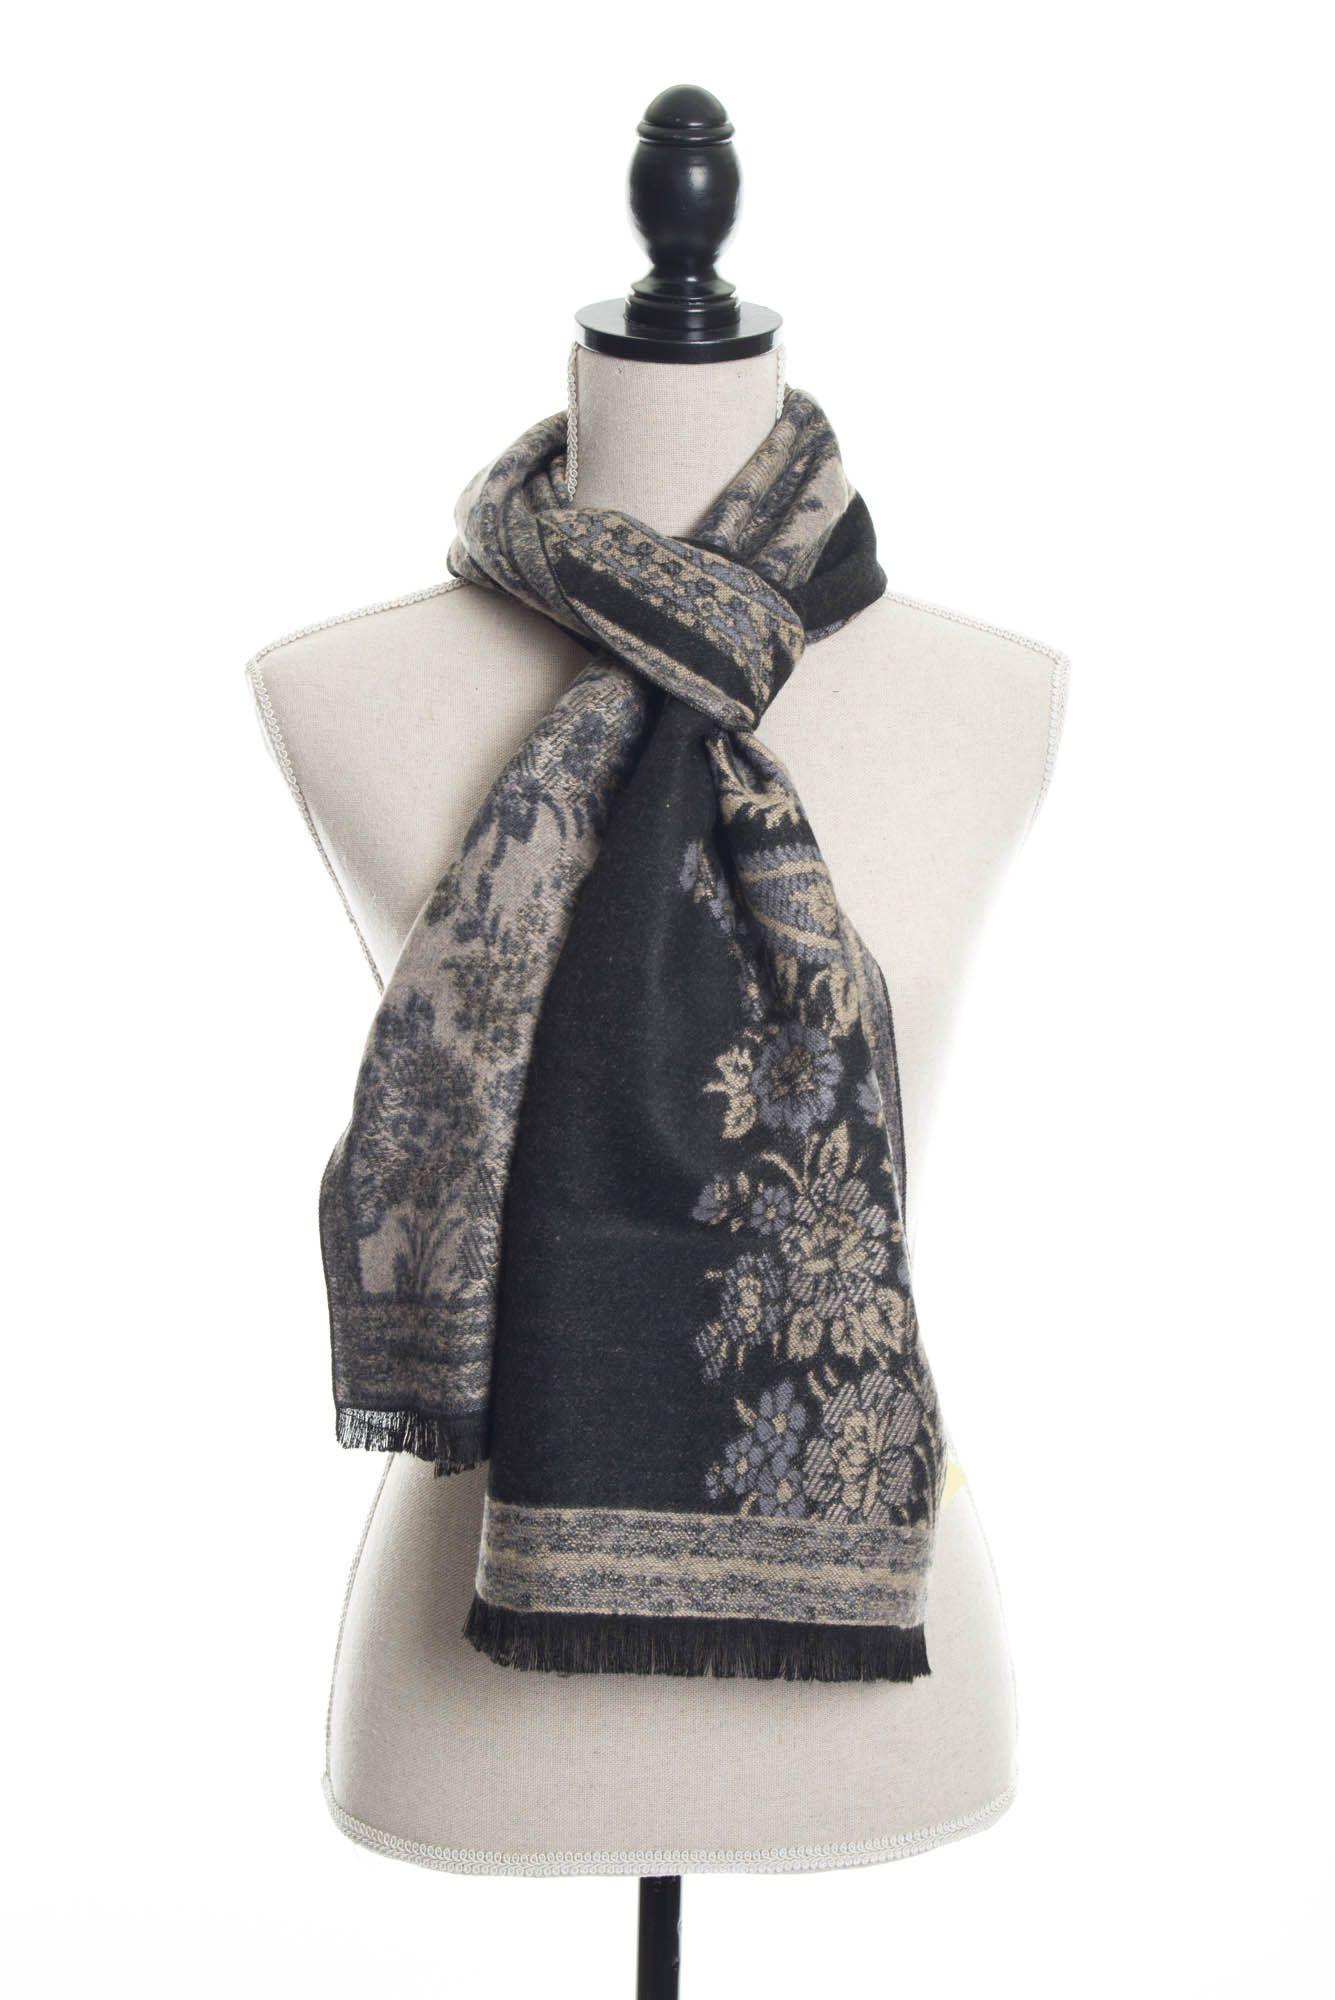 4825a74ed 100% Cashmere Floral Paisley Scarf by Rapti Fashion - Black & Tan